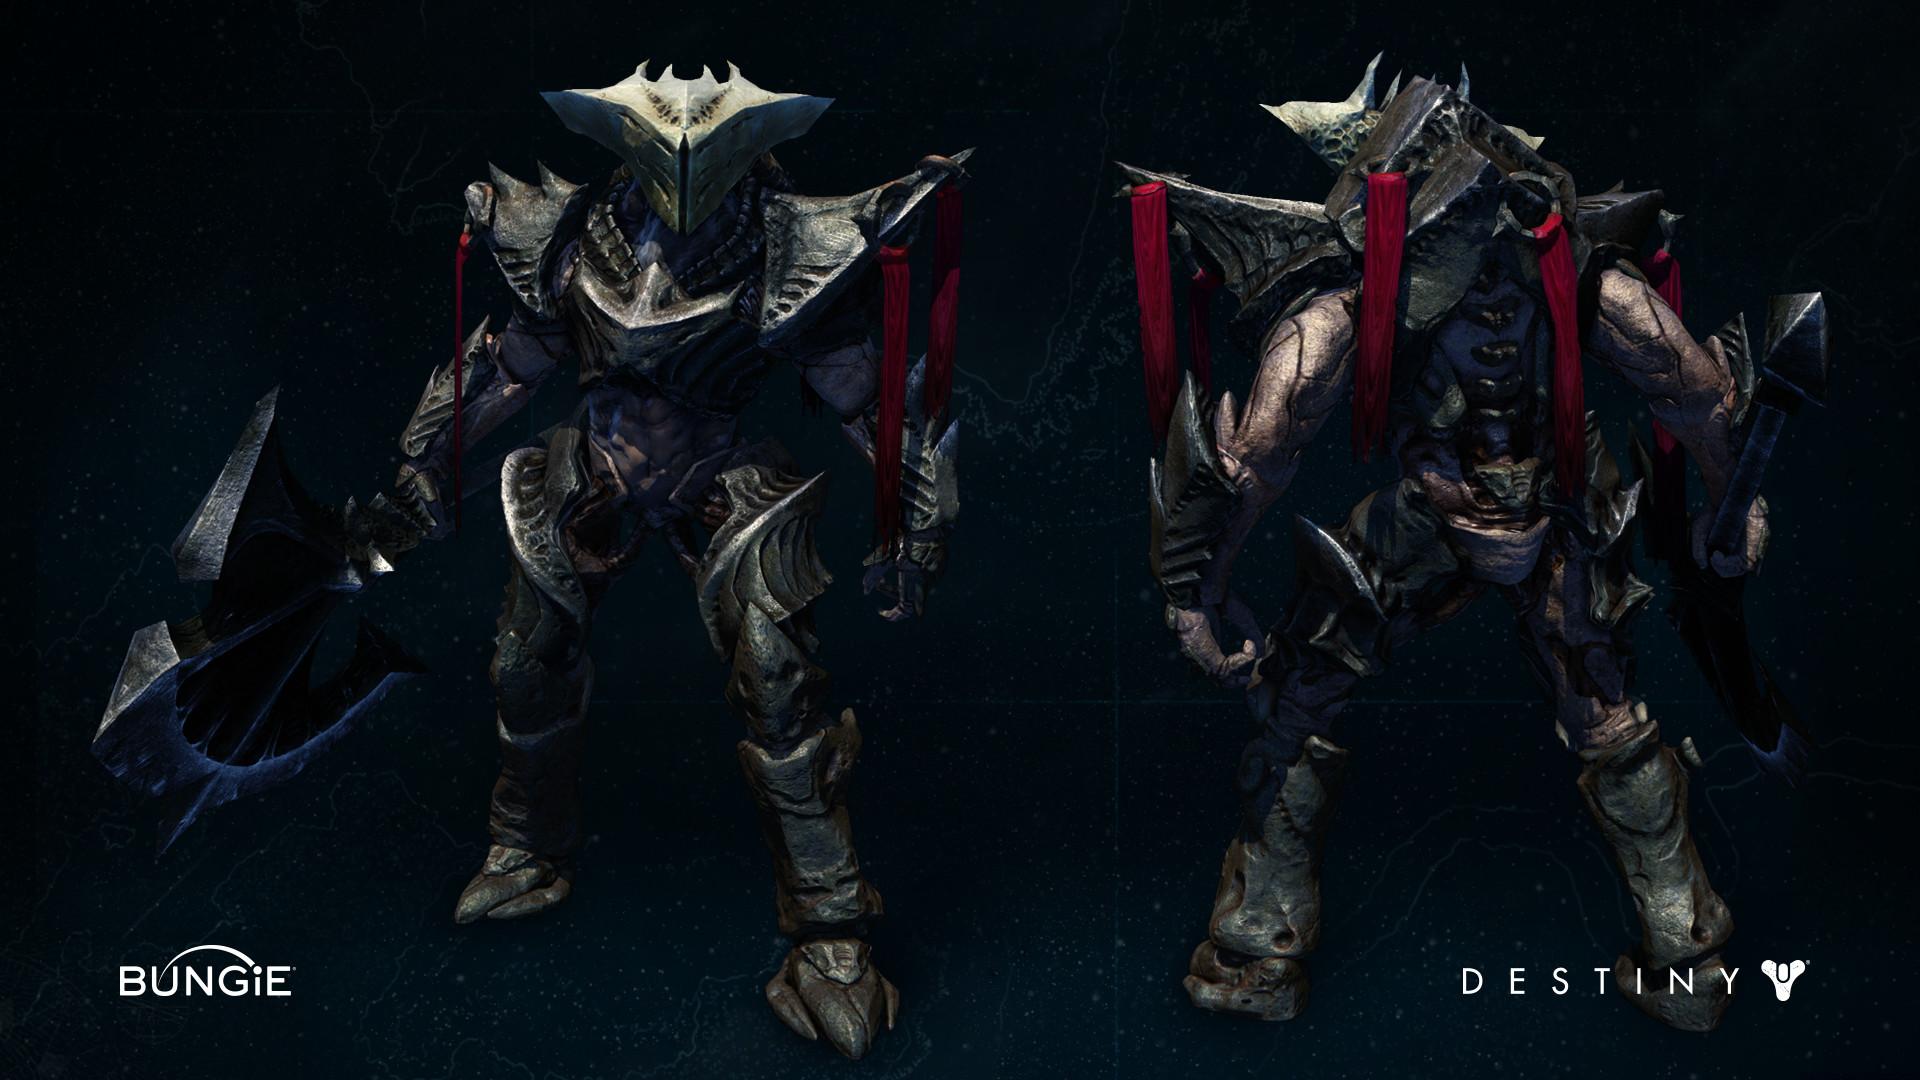 Destiny The Taken King Wallpapers – WallpaperSafari